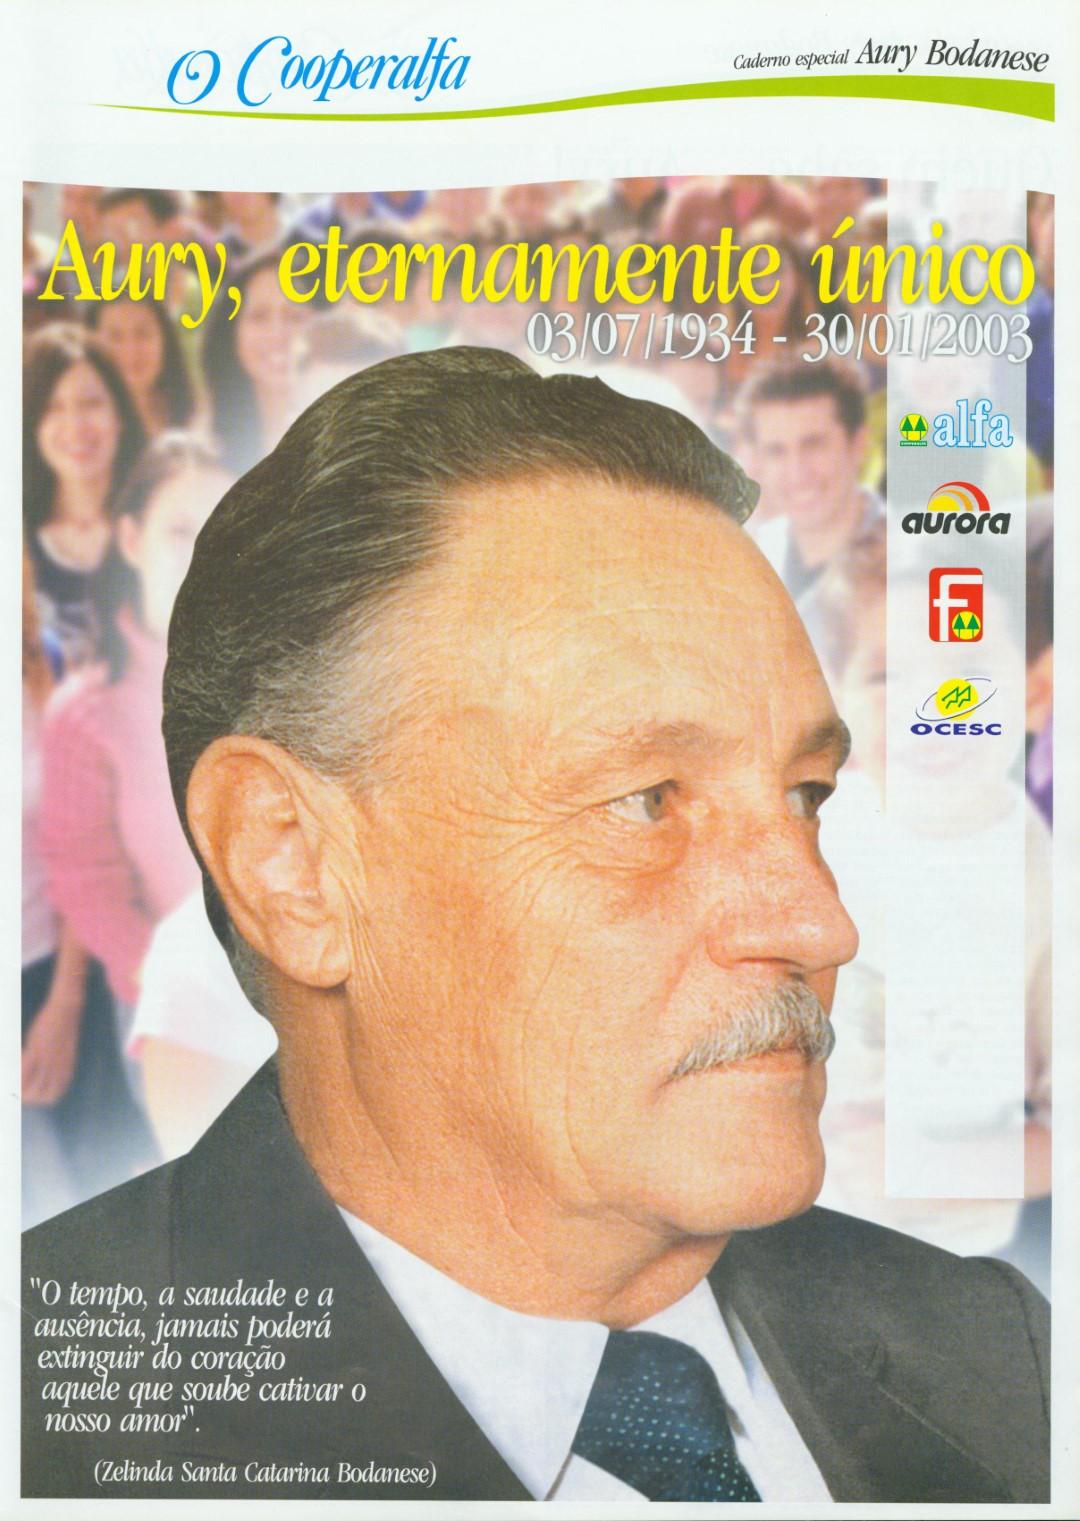 Morre Aury Luiz Bodanese